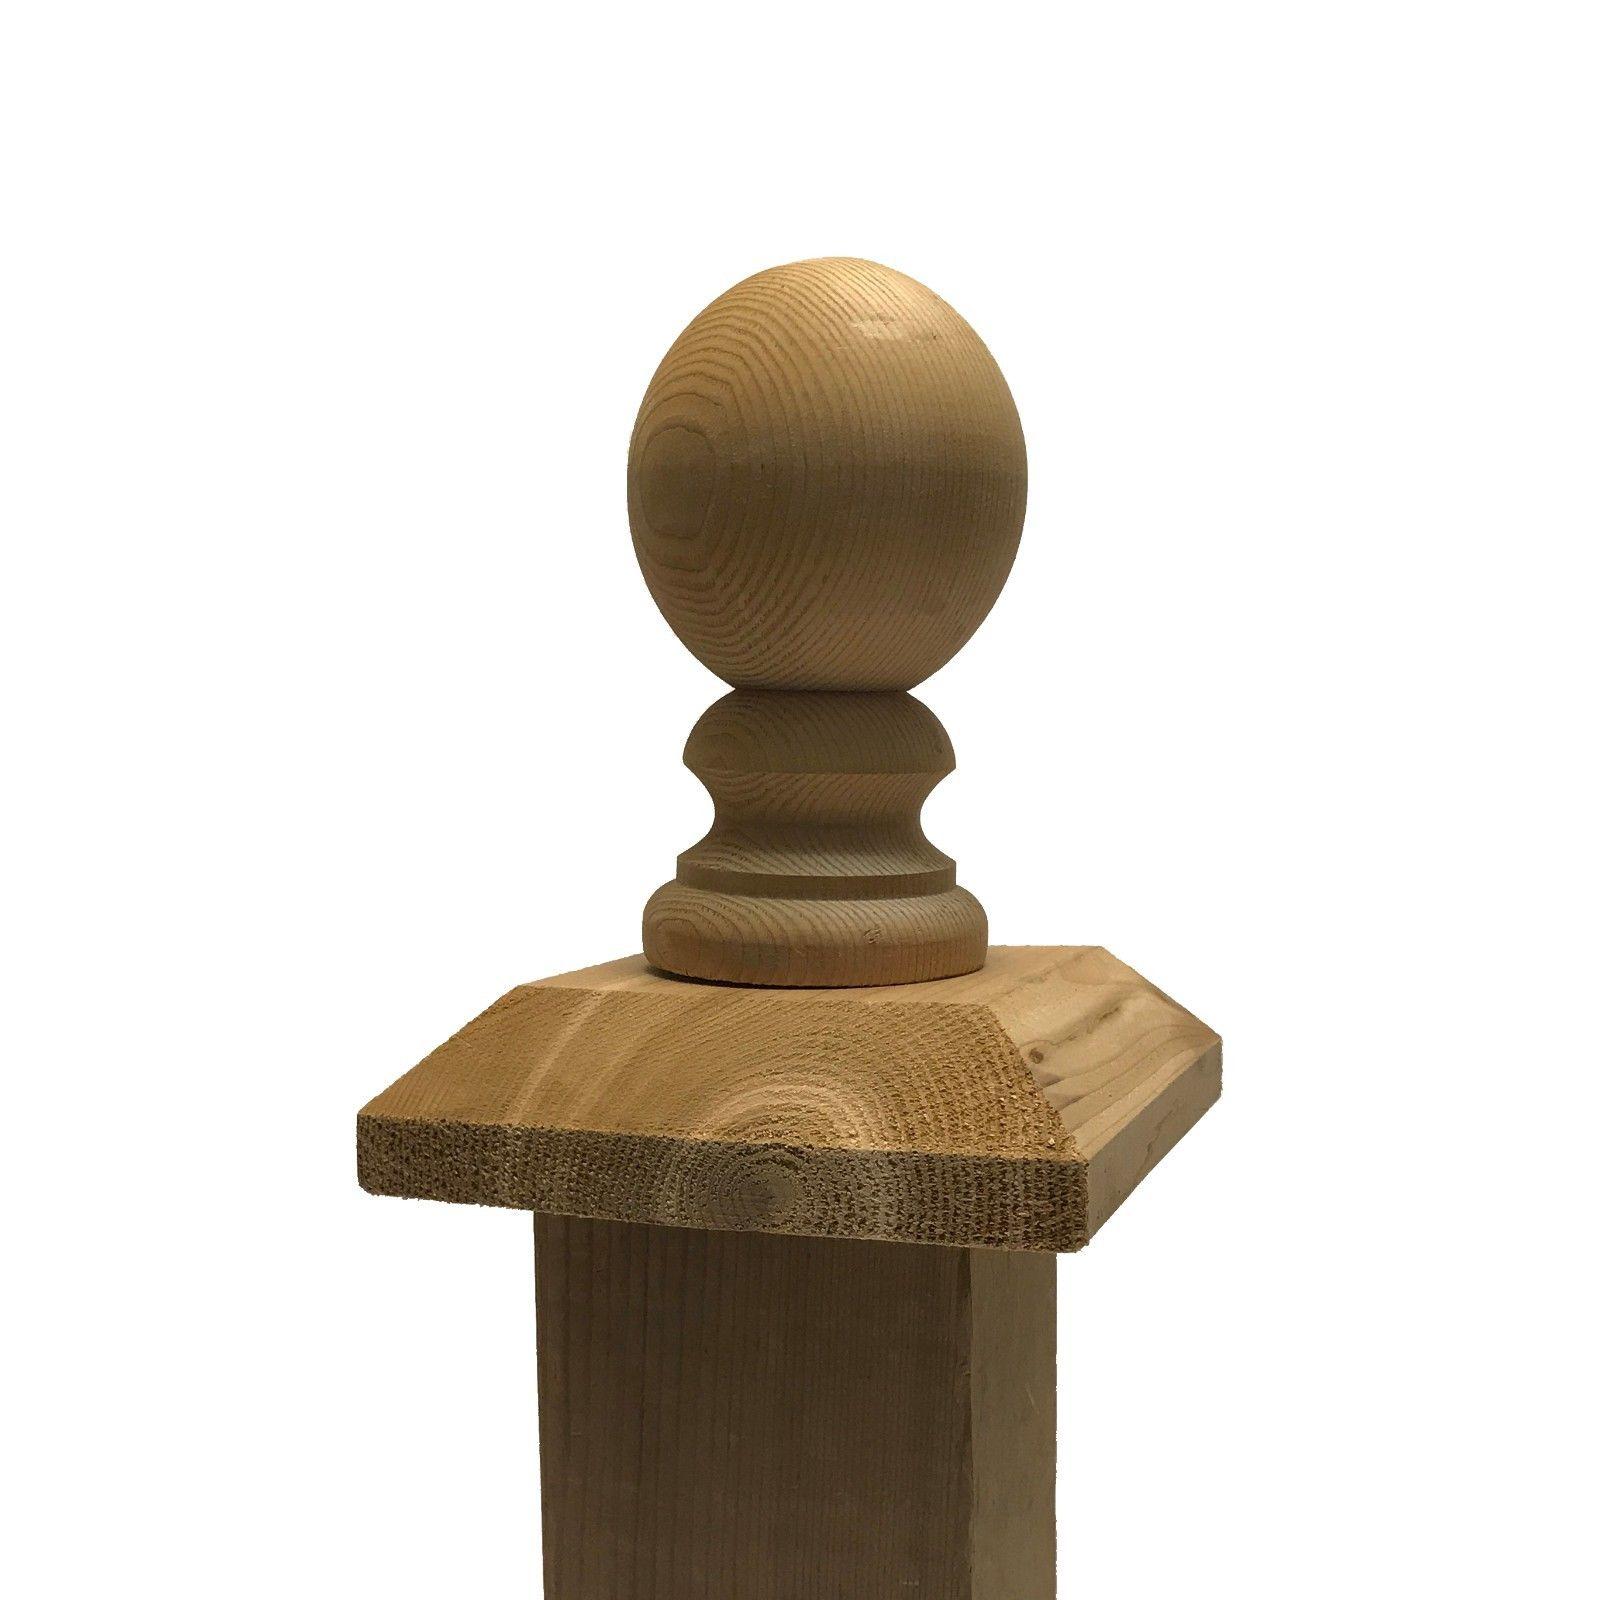 "Cedar Ball Top 3"" Finial with Flat Wood Base Cap"